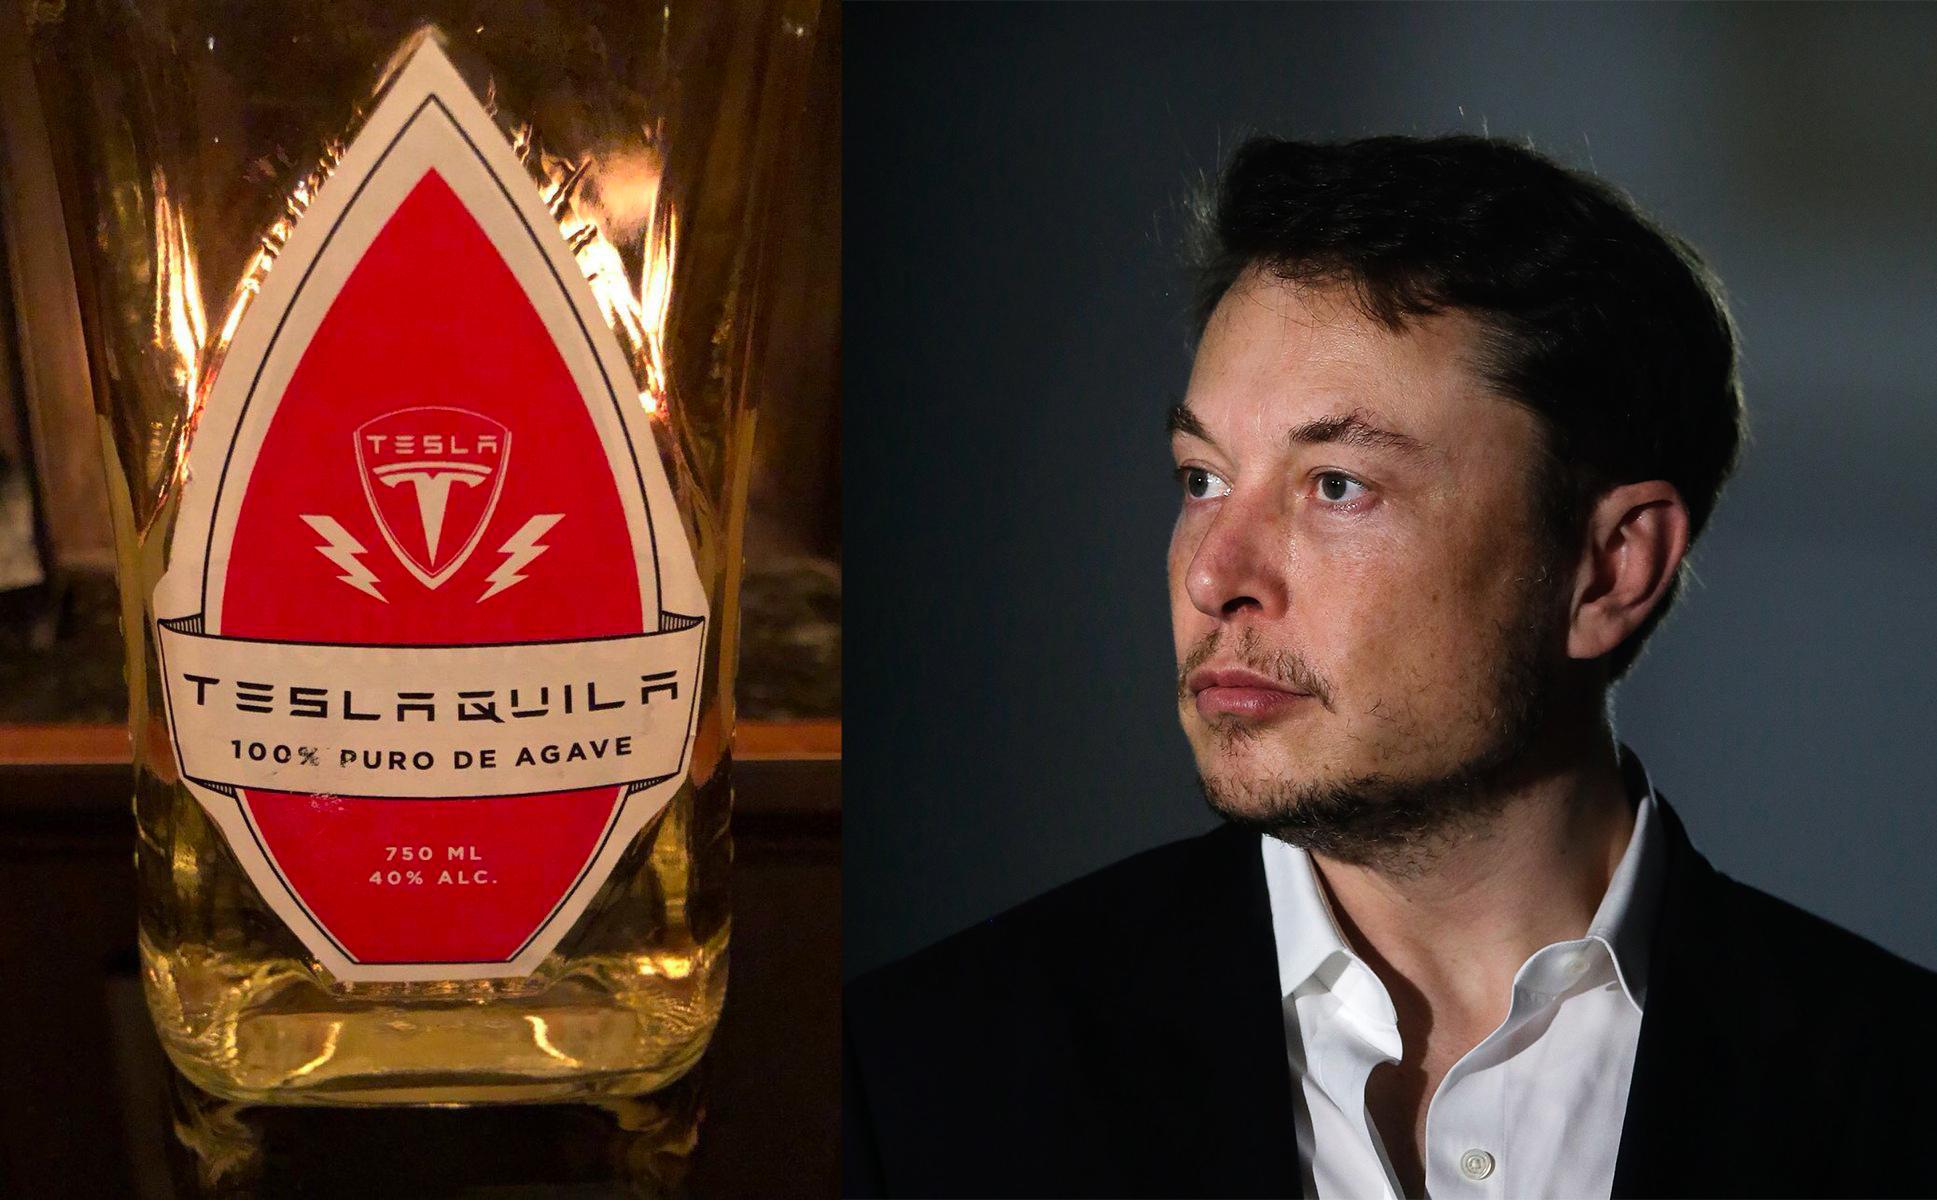 Elon-Musk.jpg.1ac95a0f541c346823db761c2d902b60.jpg